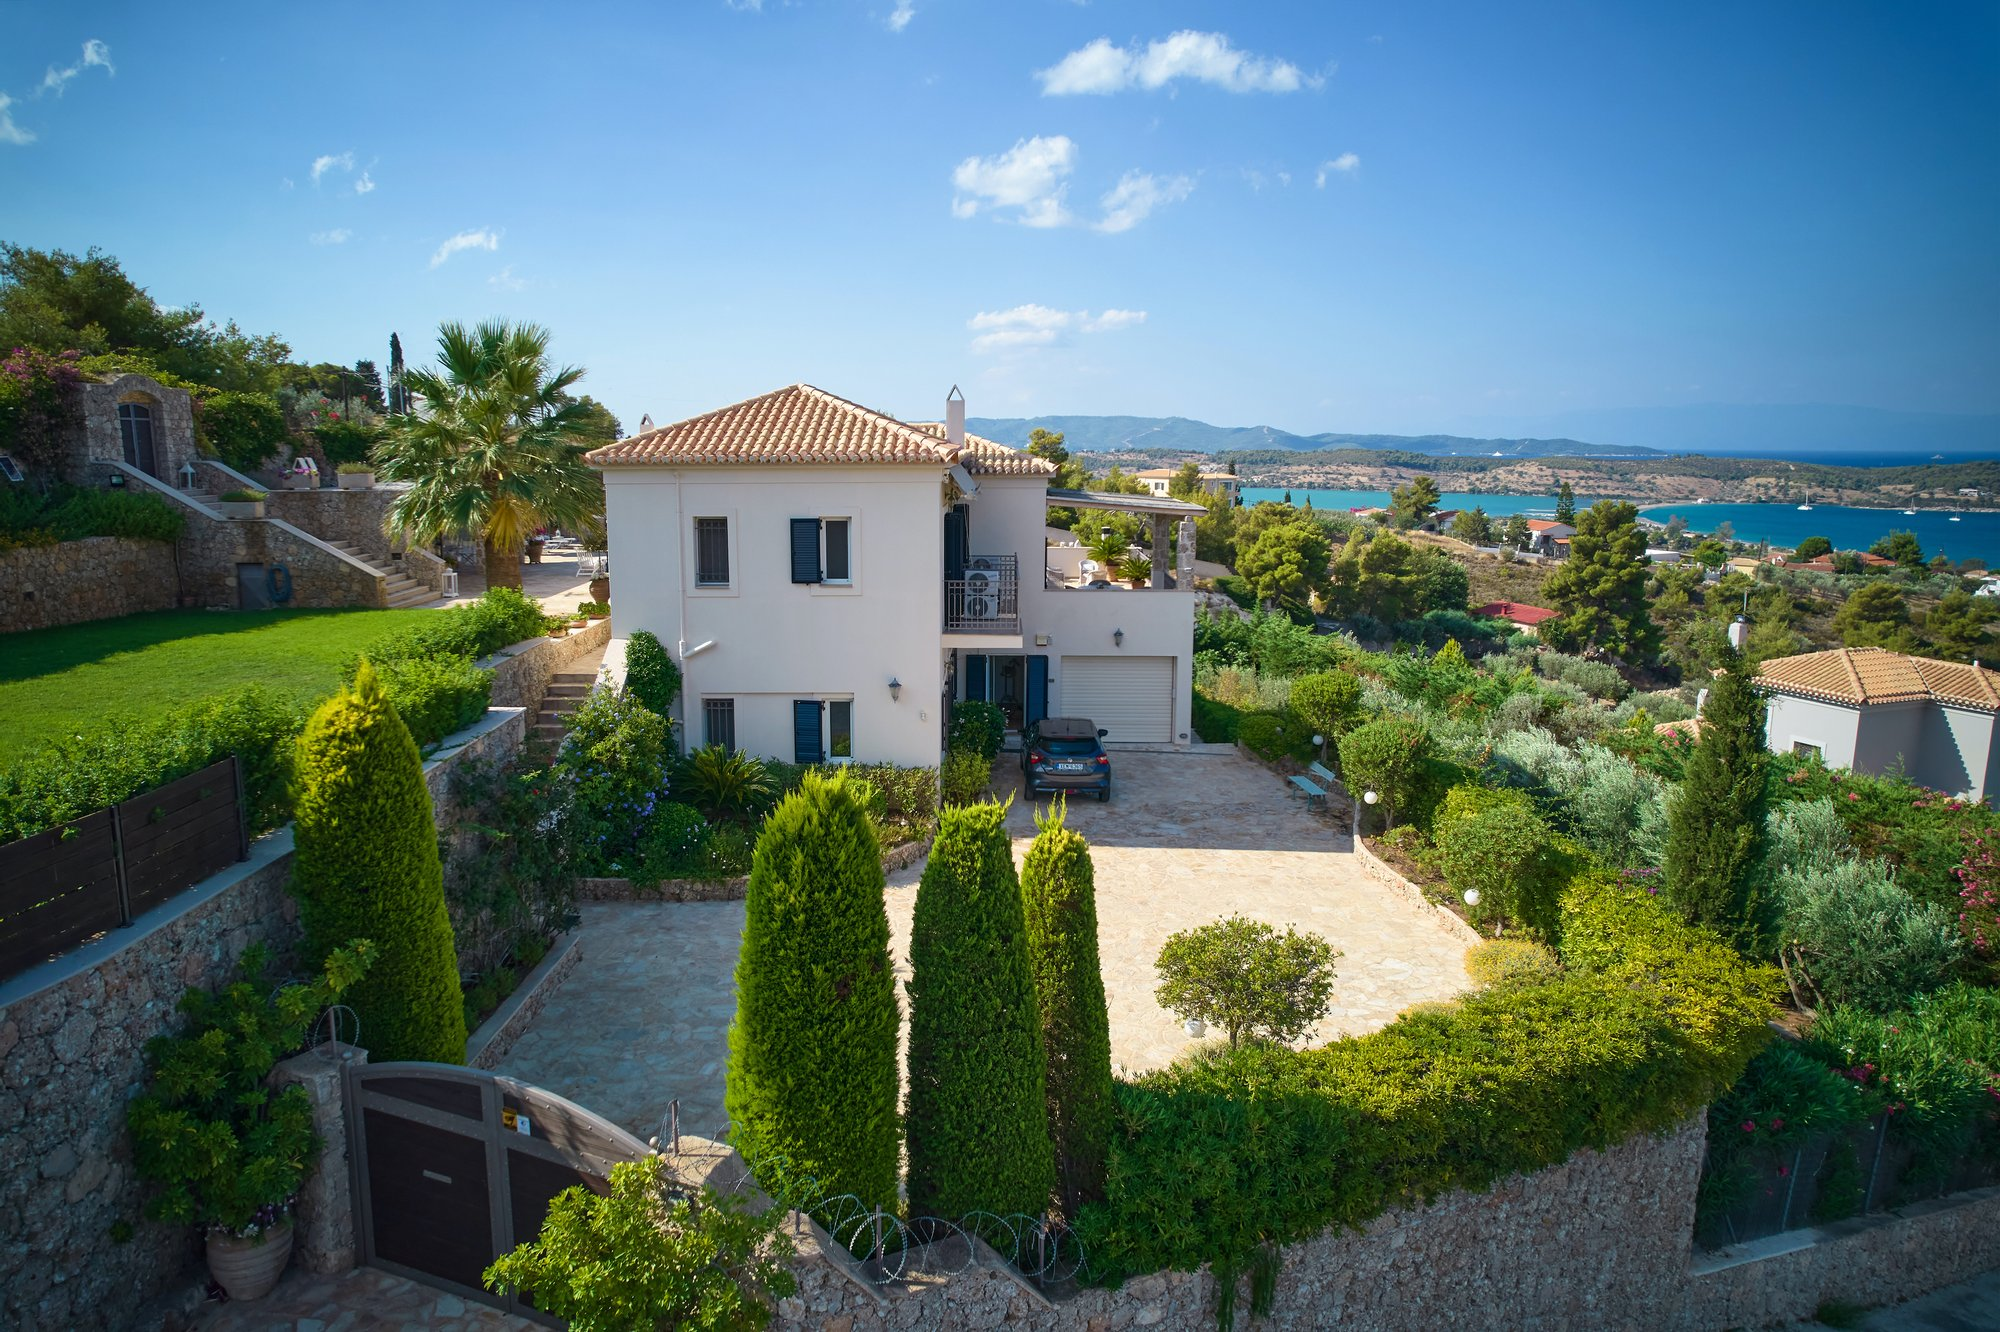 House in Greece 1 - 11523610